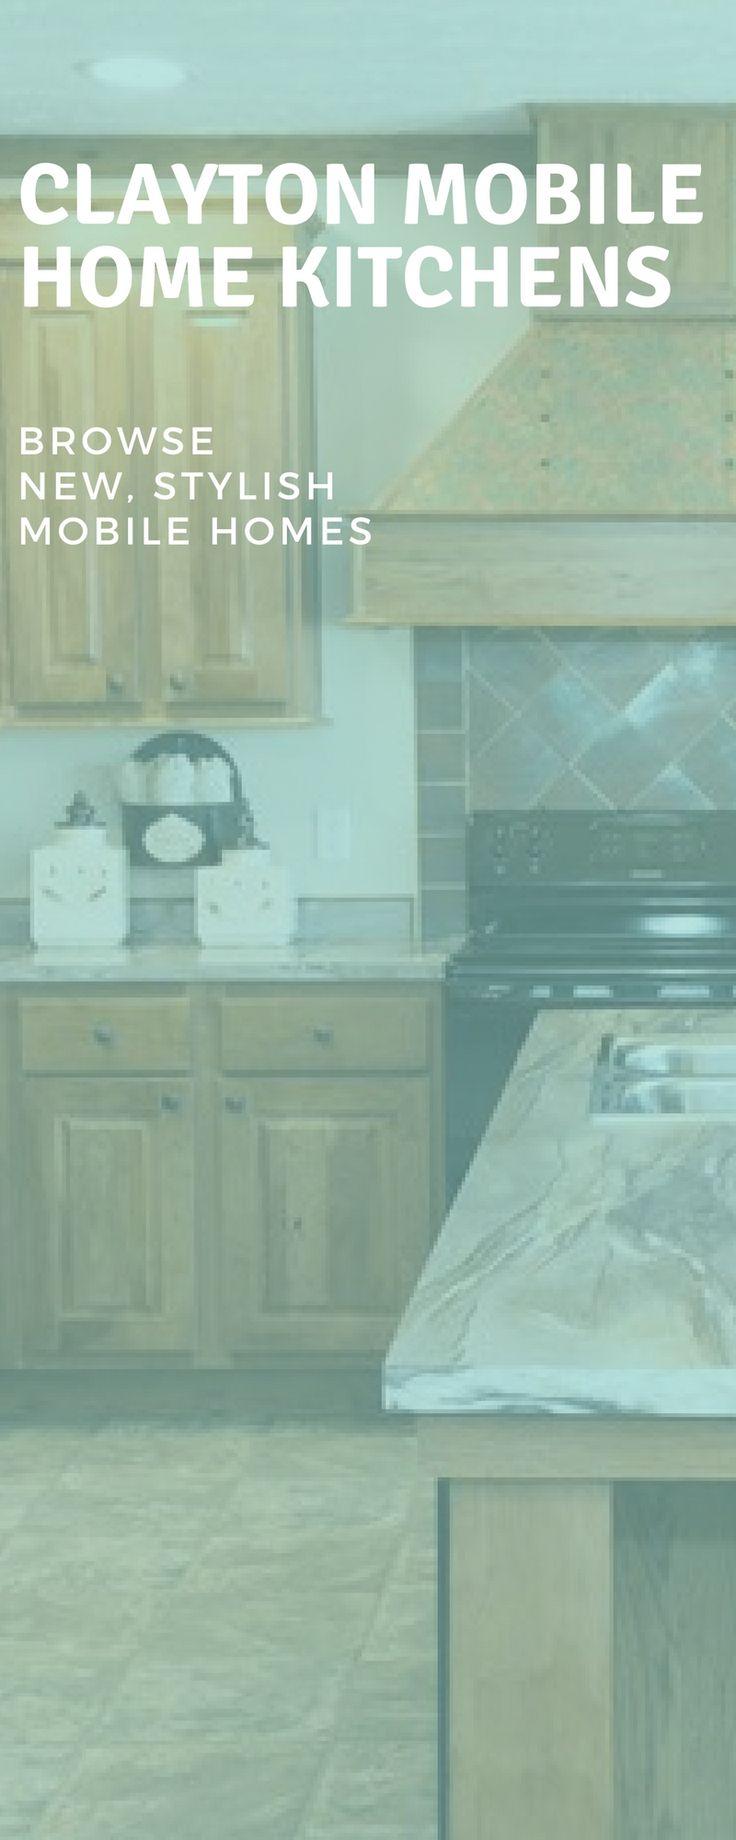 173 best Mobile Home Kitchens & Inspo images on Pinterest | Mobile ...